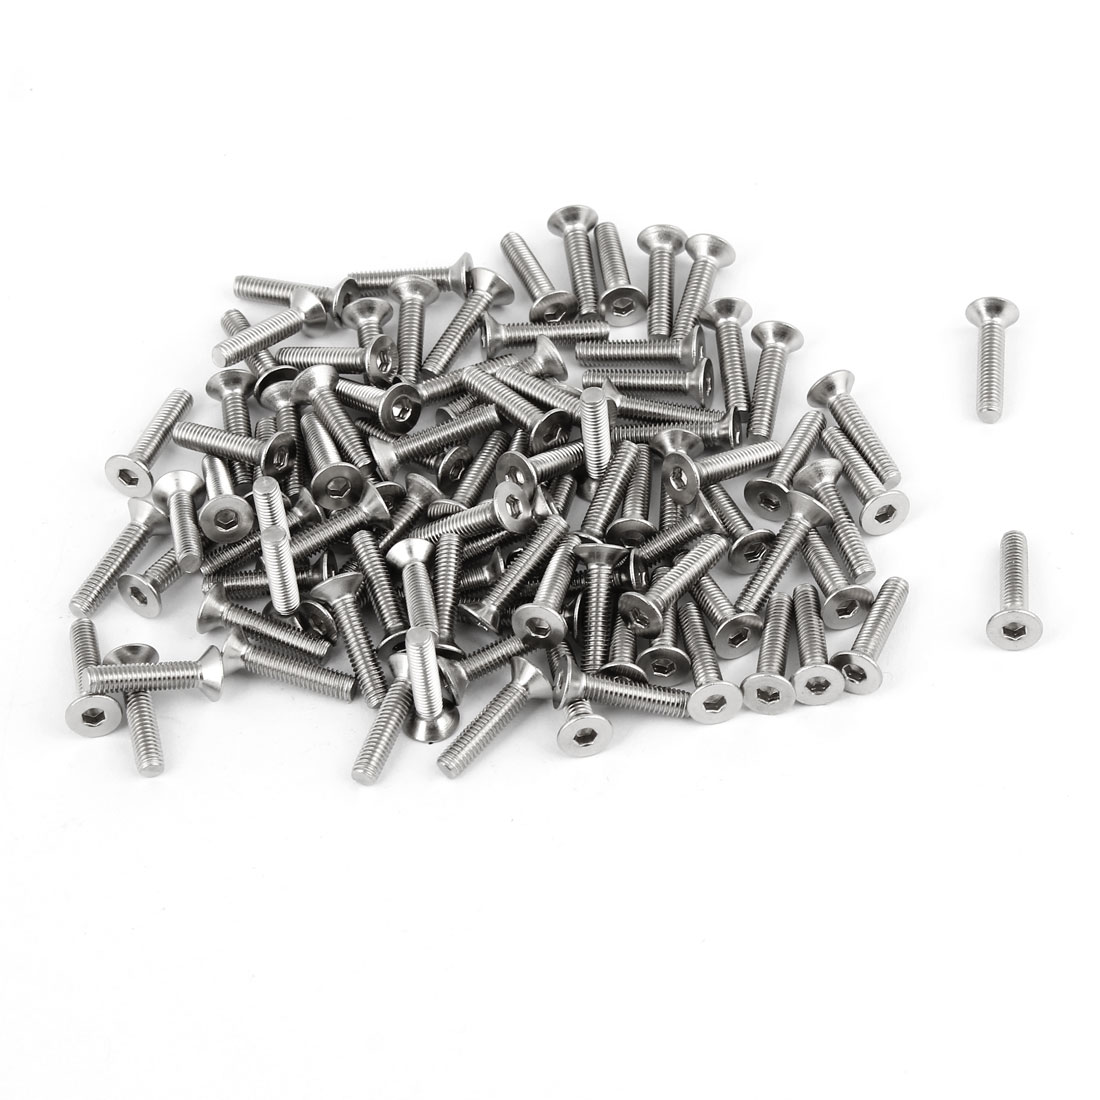 100Pcs 304HC Stainless Steel Countersunk Flat Head Hex Key Bolt Screw M3x14mm